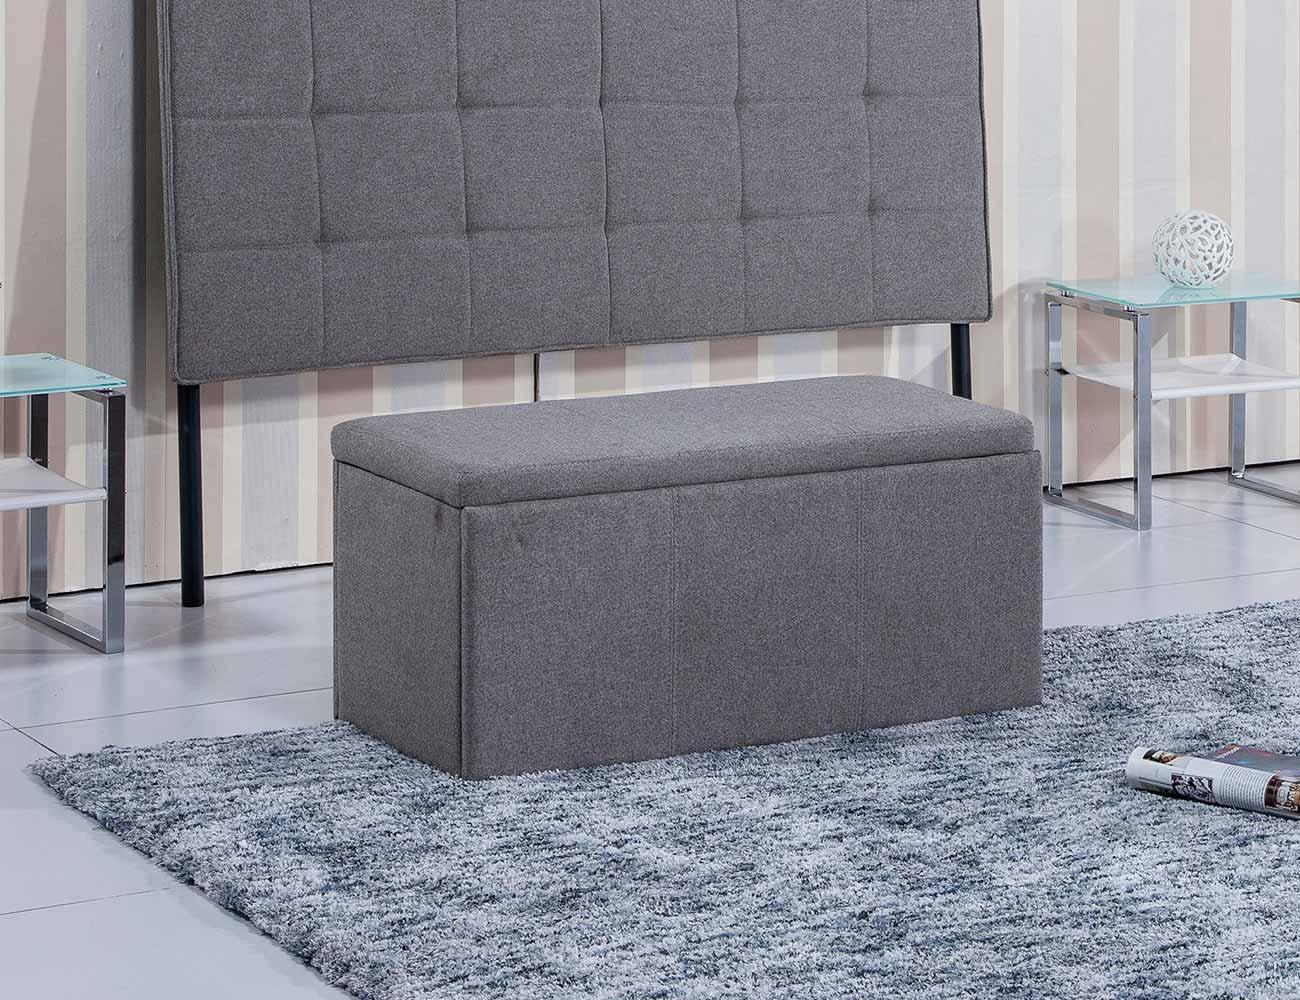 Baul tapizado gris ceniza